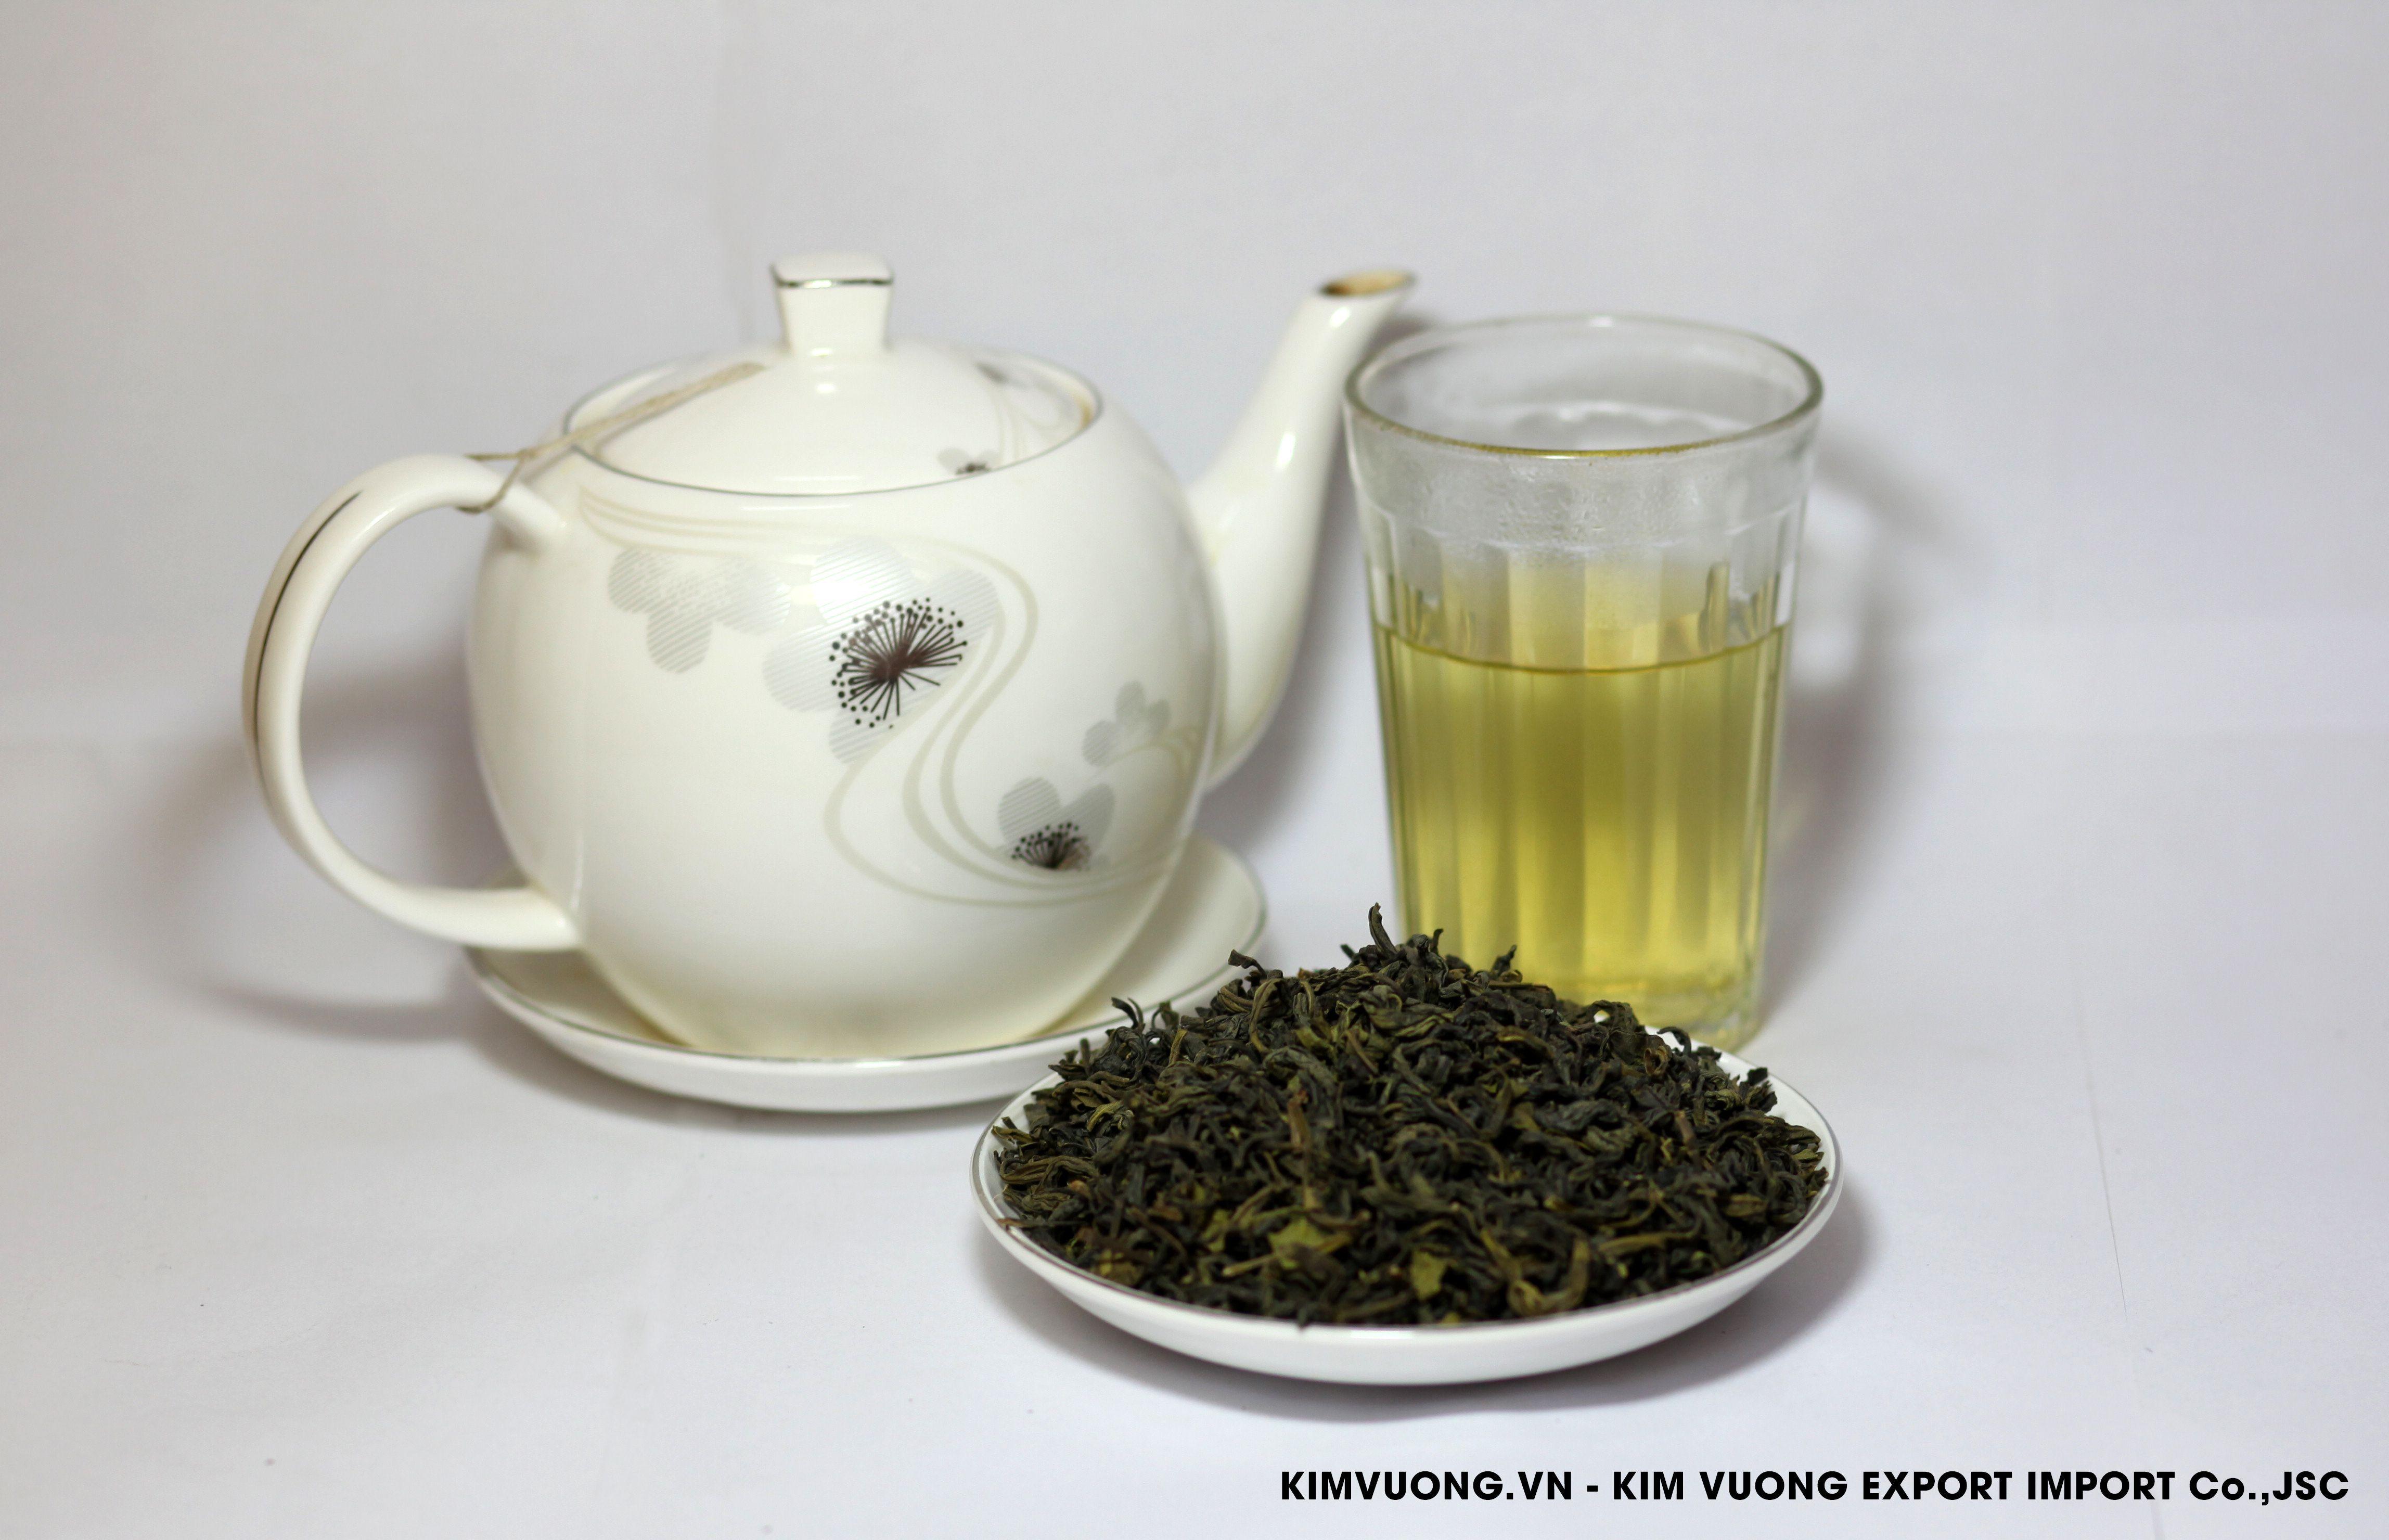 Green tea OP 488  - KIM VUONG EXPORT IMPORT Co.,JSC